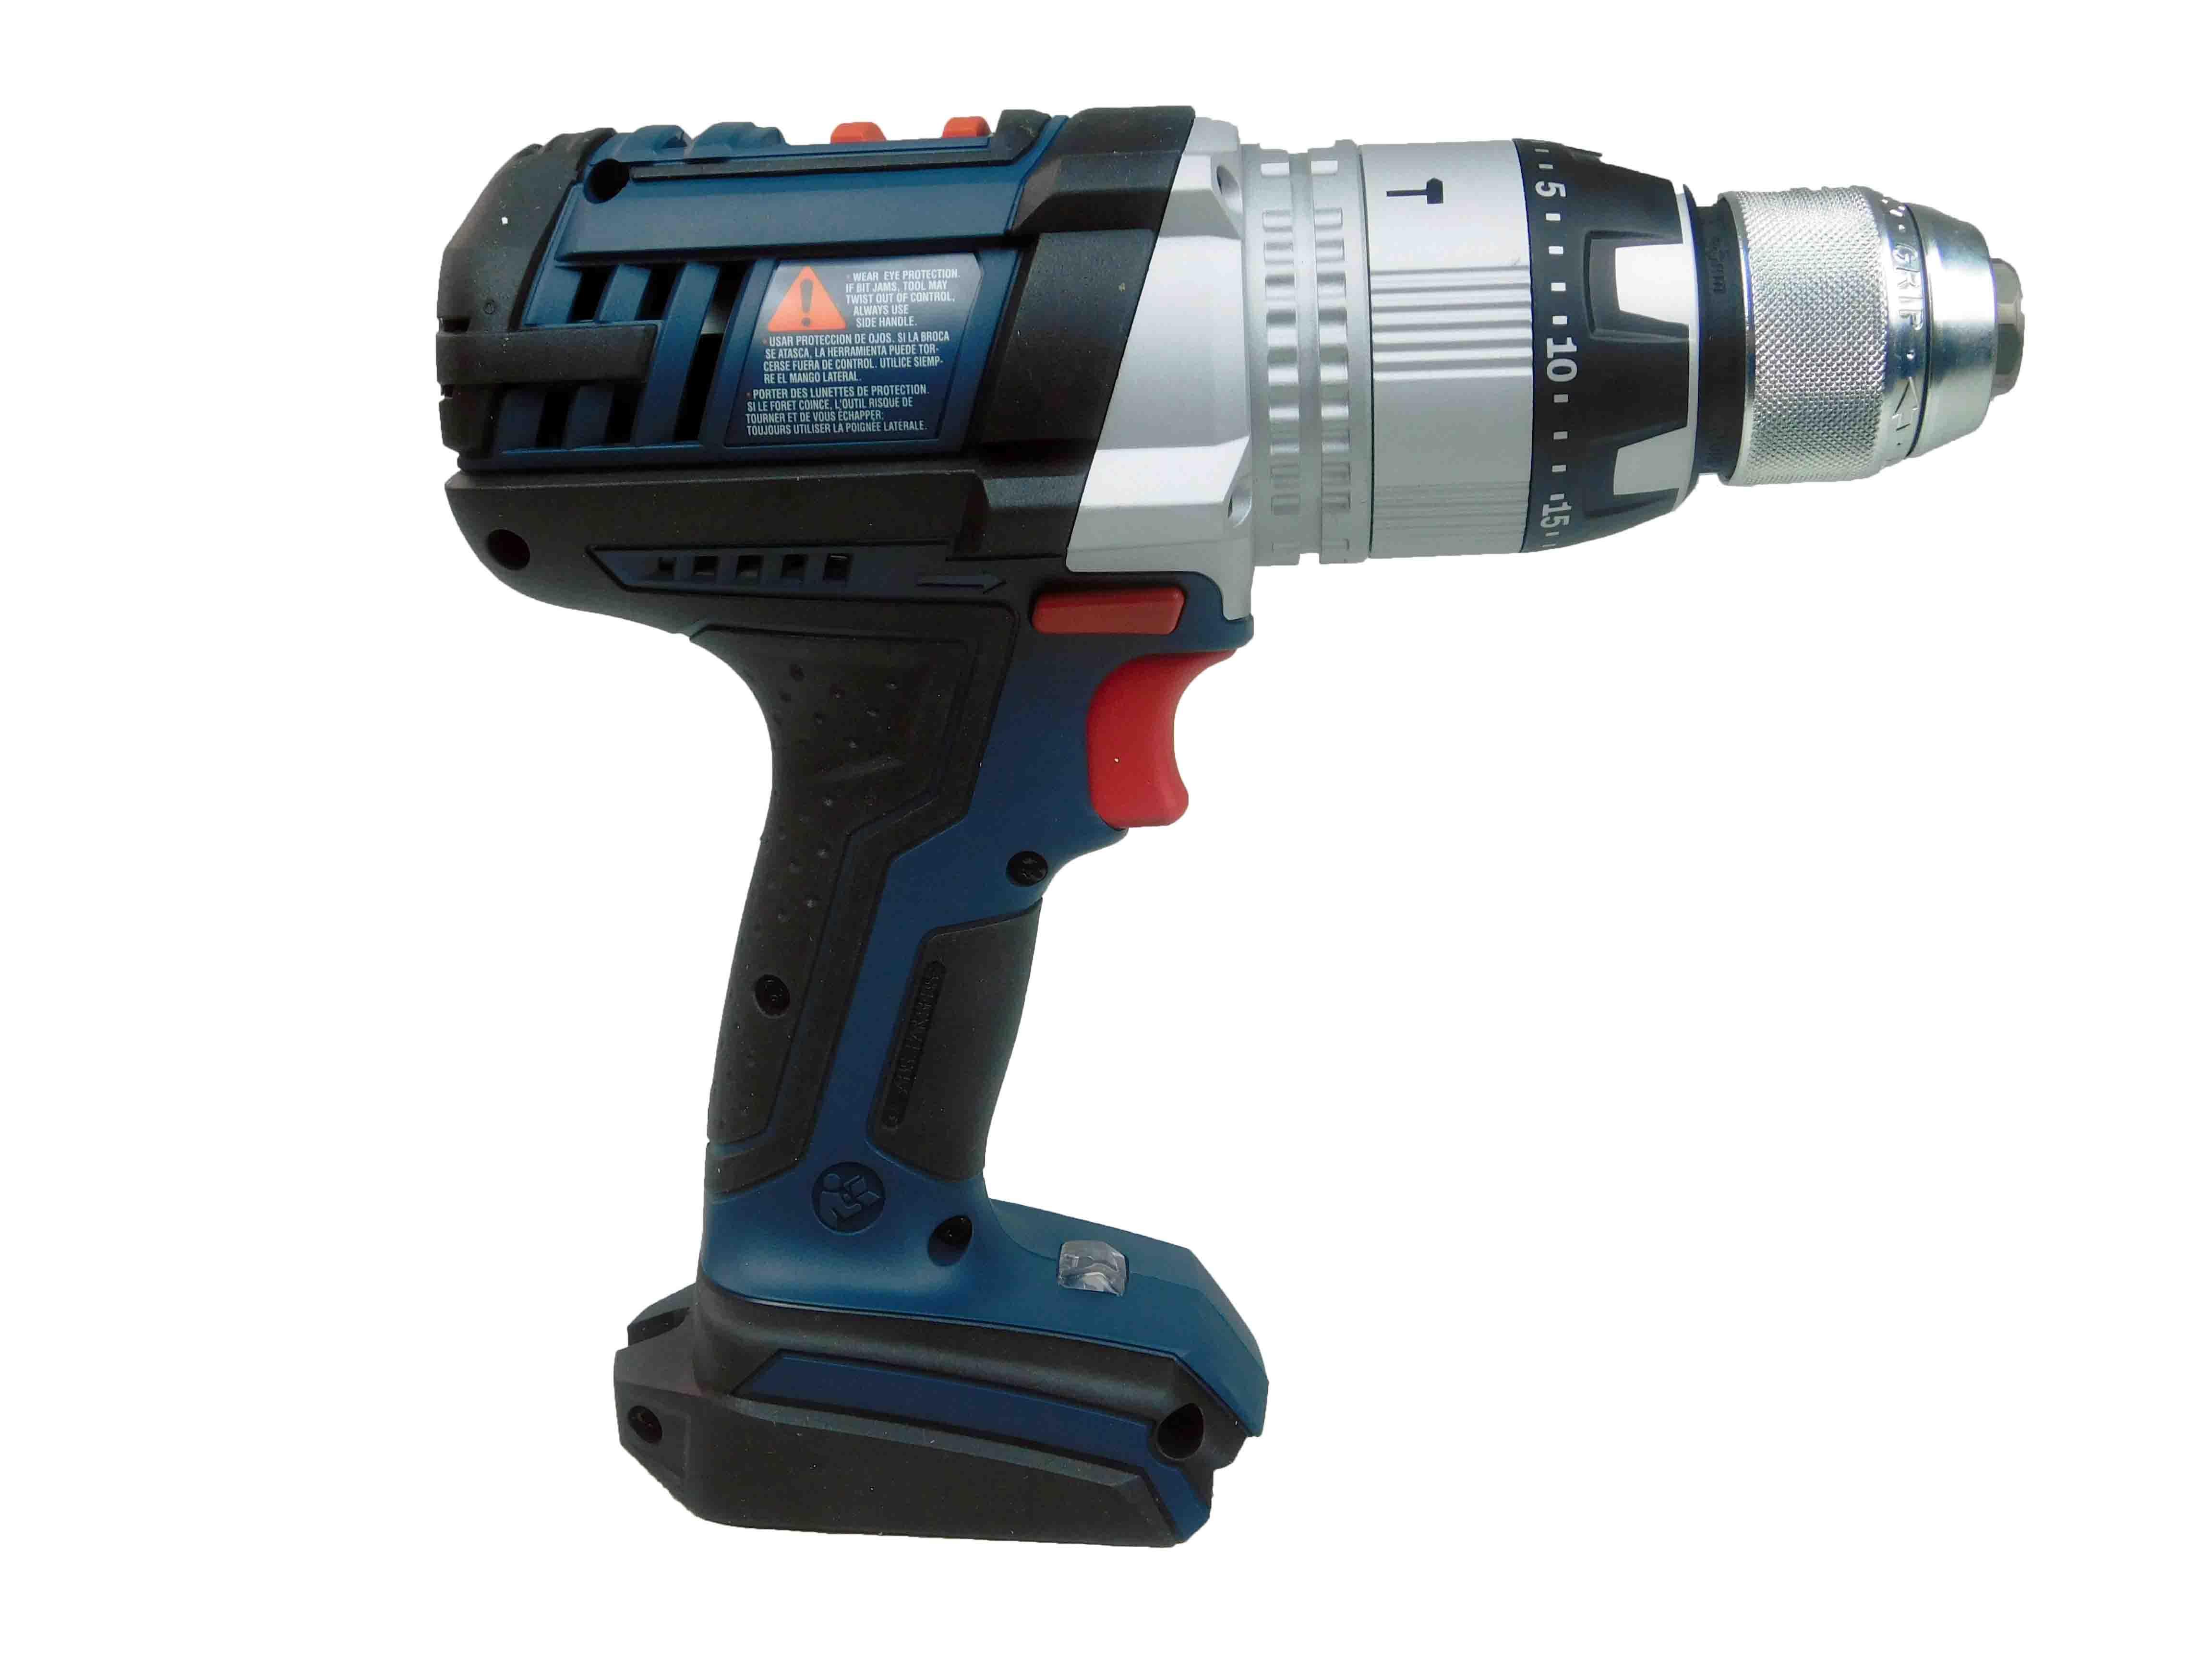 Bosch-HDH181XB18V-Brute-Tough-1-2-In.-Hammer-Drill-Driver-image-5